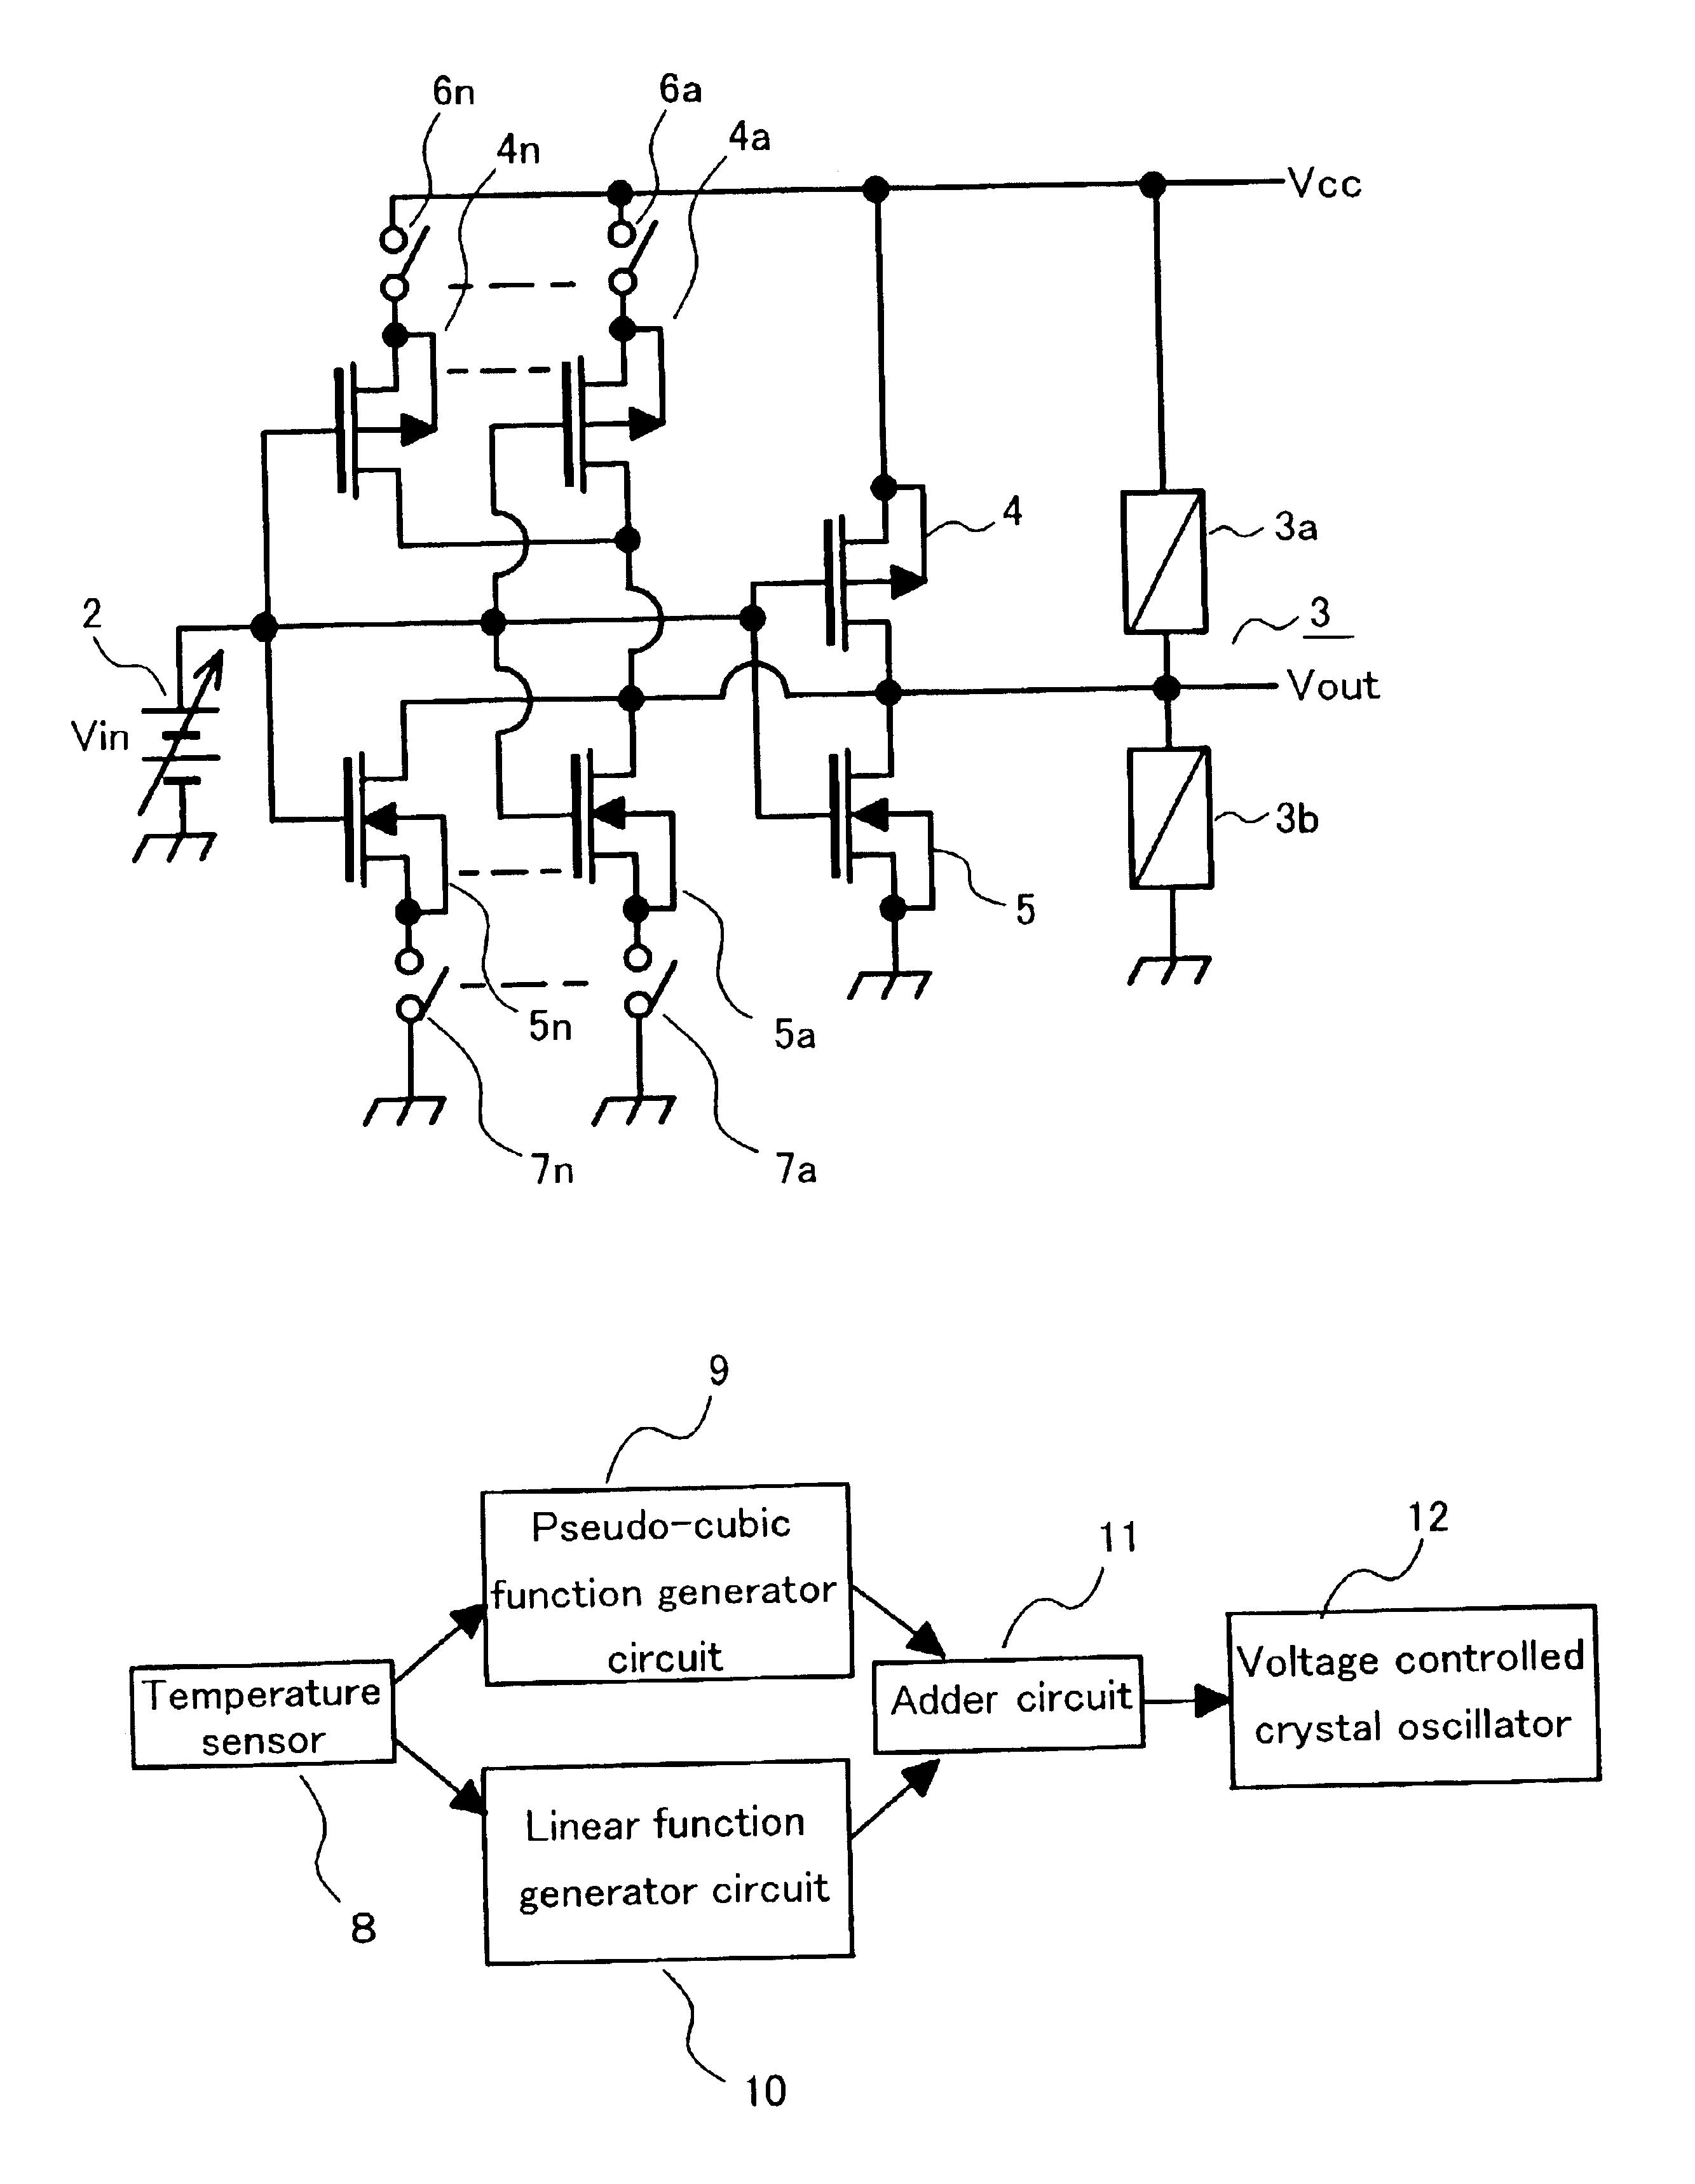 Us6781472 Pseudo Cubic Function Generator Circuit Oscillator Diagram Composed Of Crystal Inverter Patent Drawing